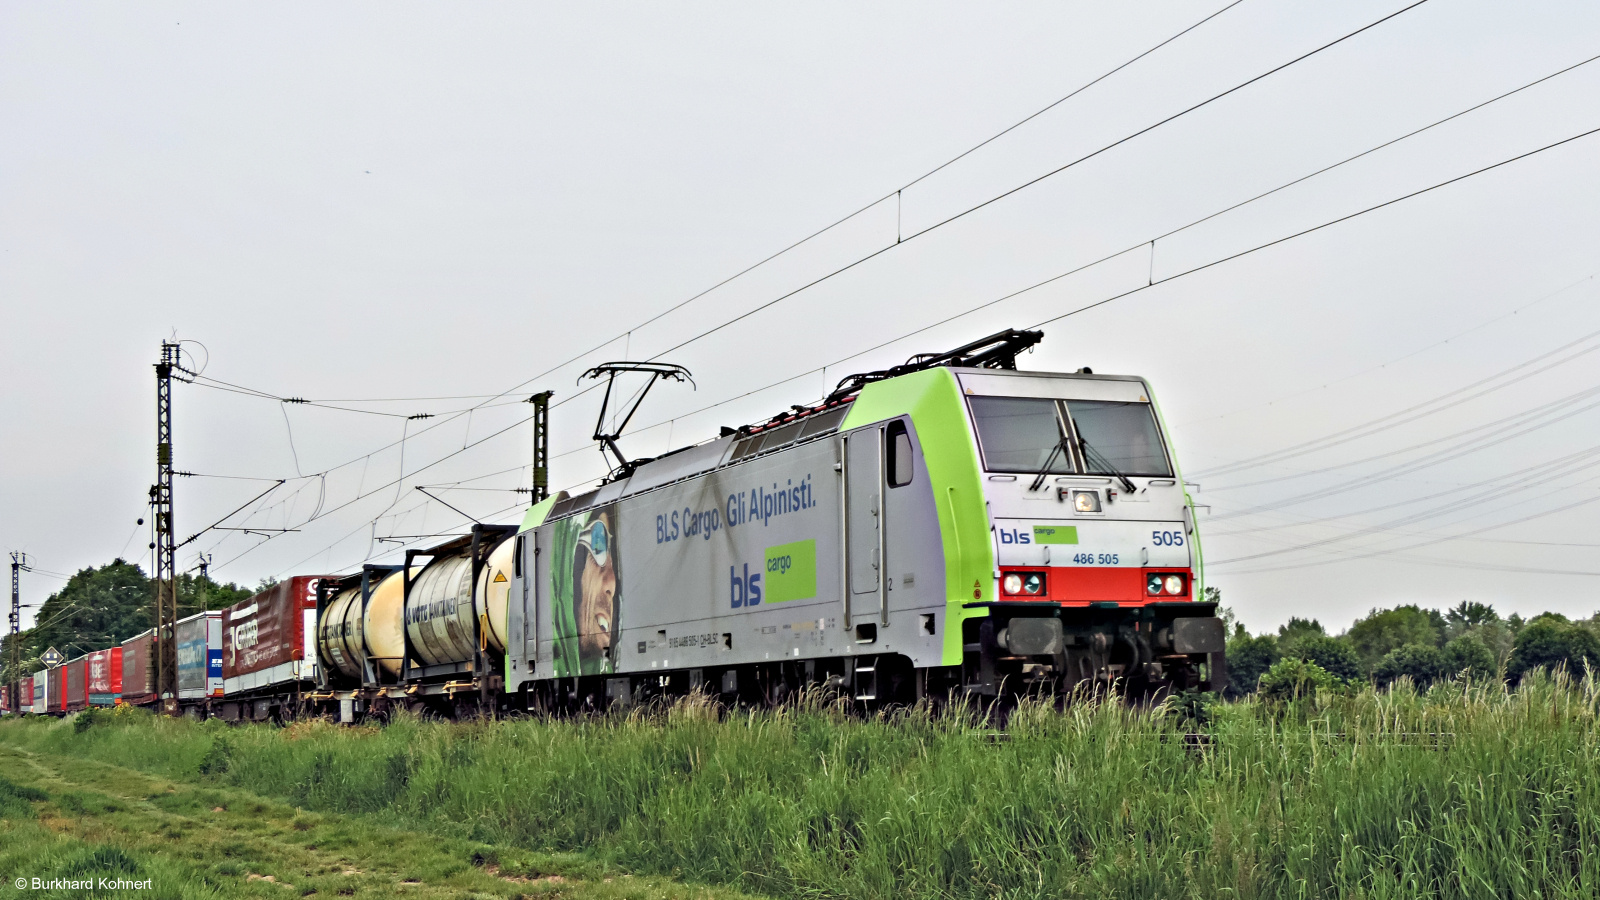 486 505 - BLS Cargo